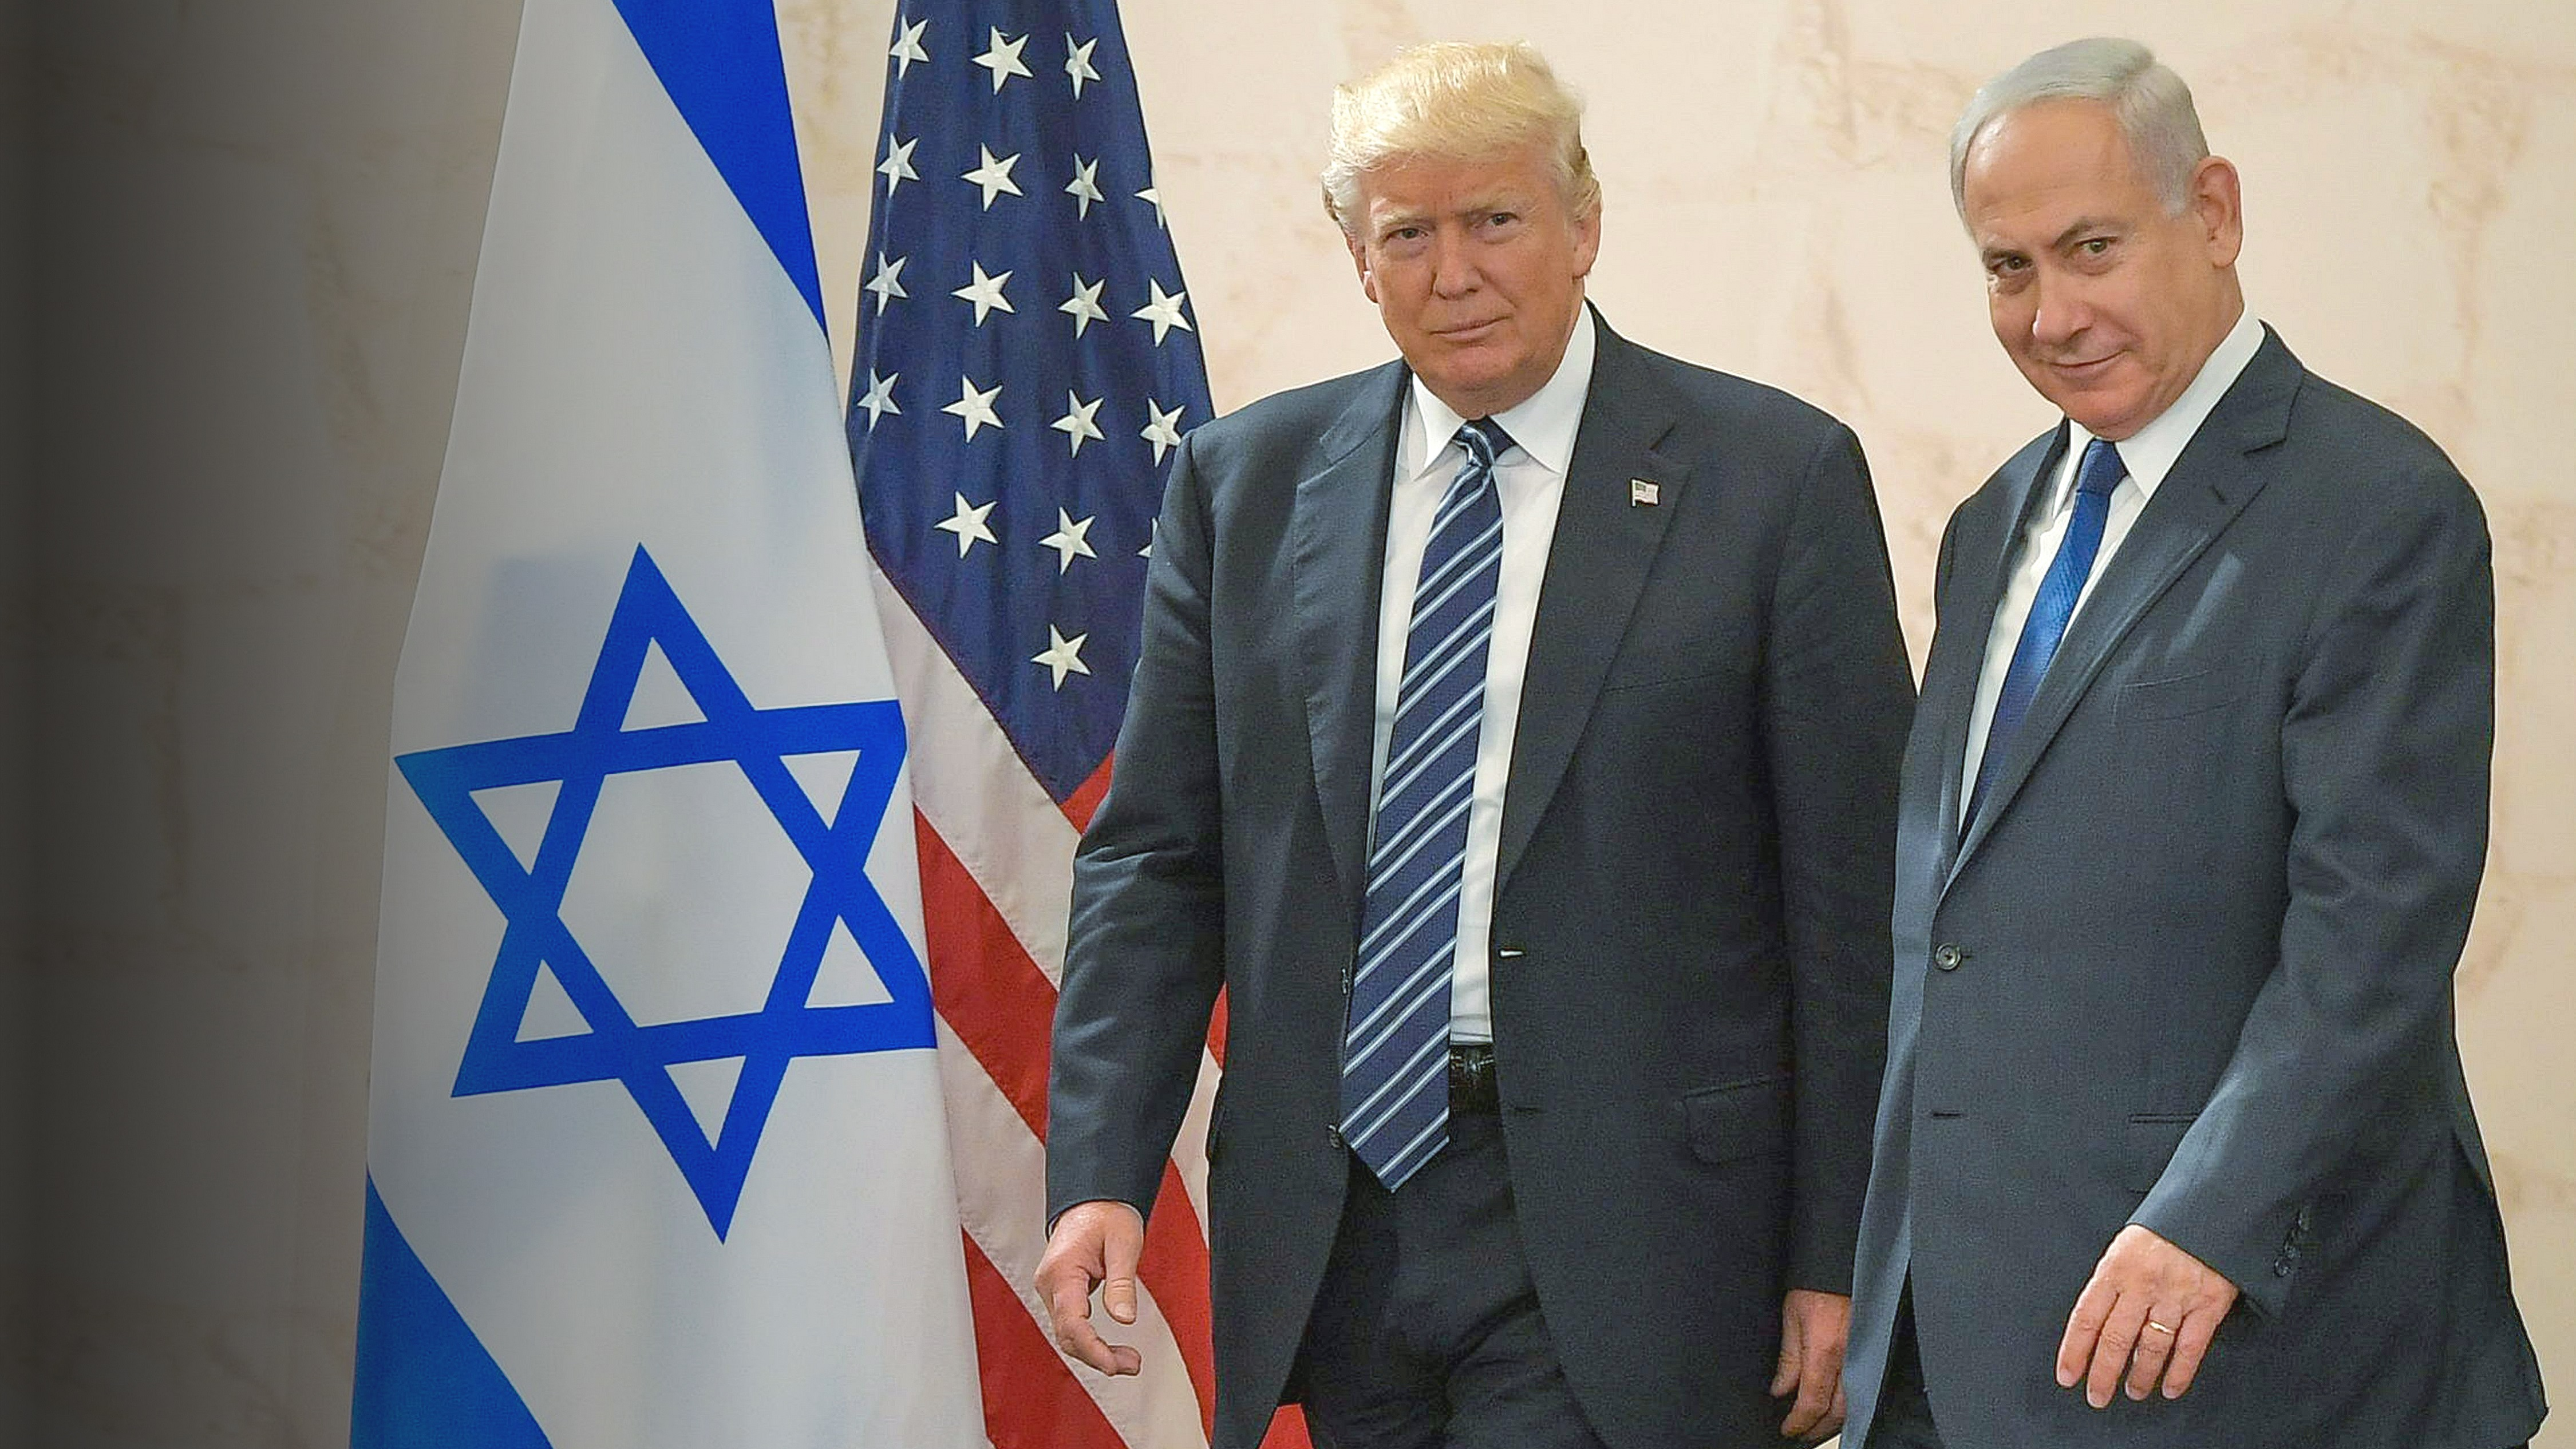 Men/'s Ladies T SHIRT politics middle east FREE PALESTINE anti trump peace